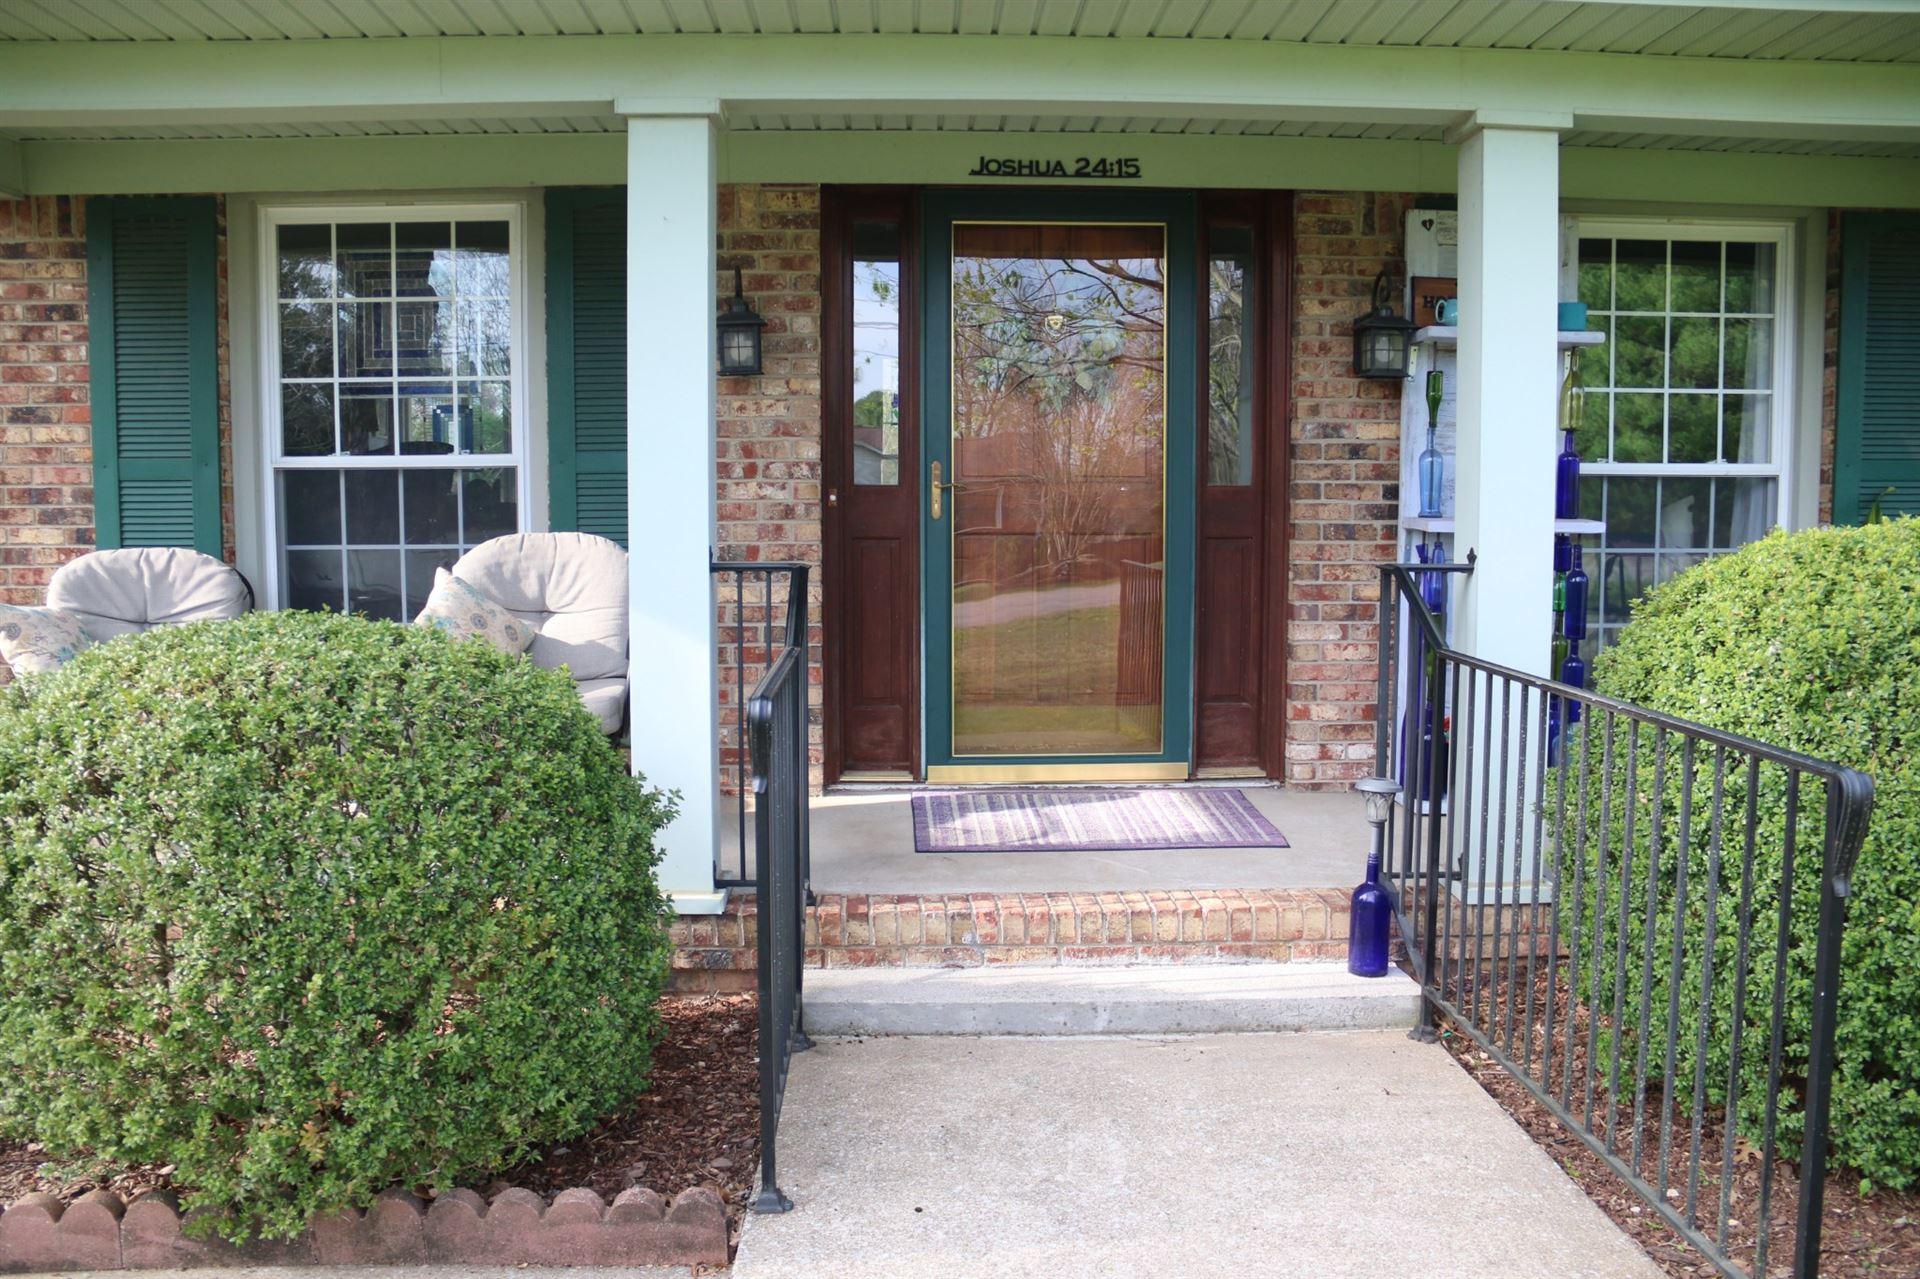 Photo of 205 Kensington Pl, Franklin, TN 37067 (MLS # 2245773)